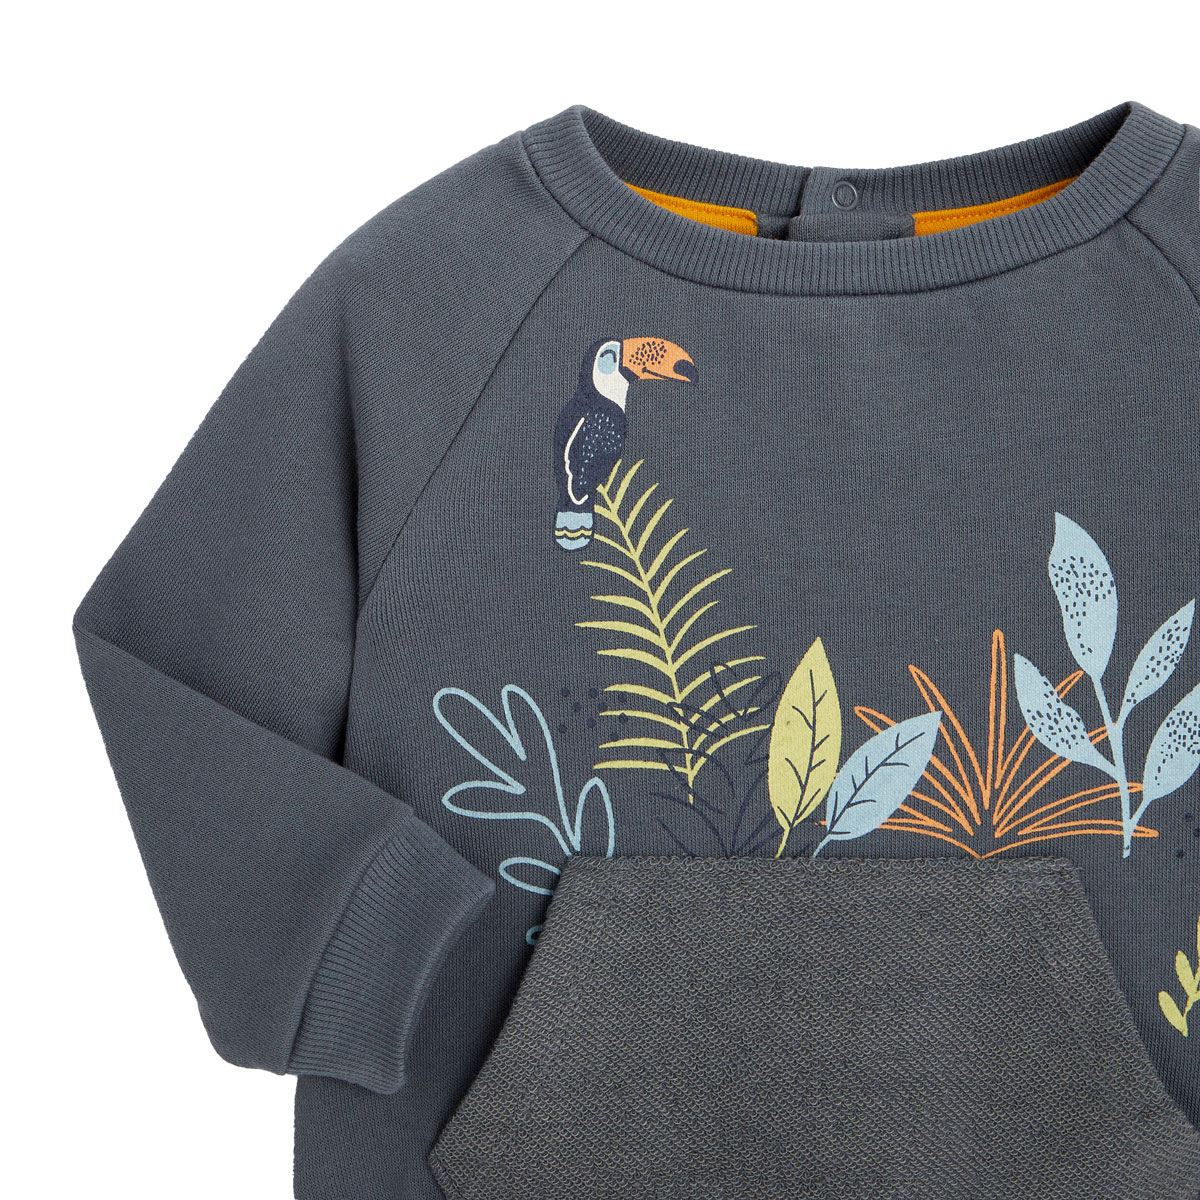 Sweat-shirt garçon contenant du coton gratté bio Aloha Havana zoom